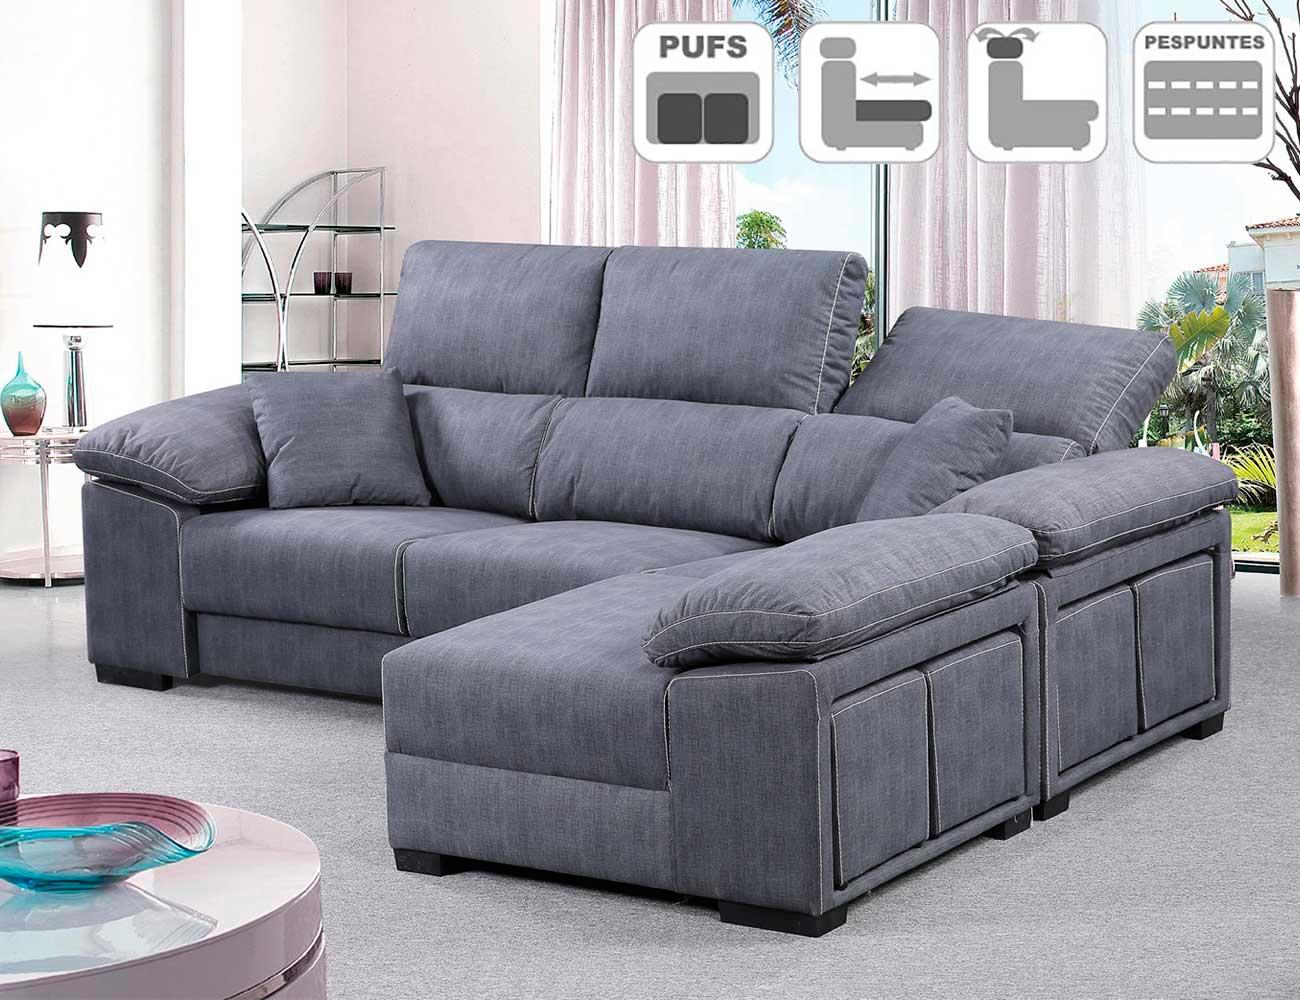 Sofa chaiselongue reversible 4 taburetes asientos extraible gris ceniza detalle